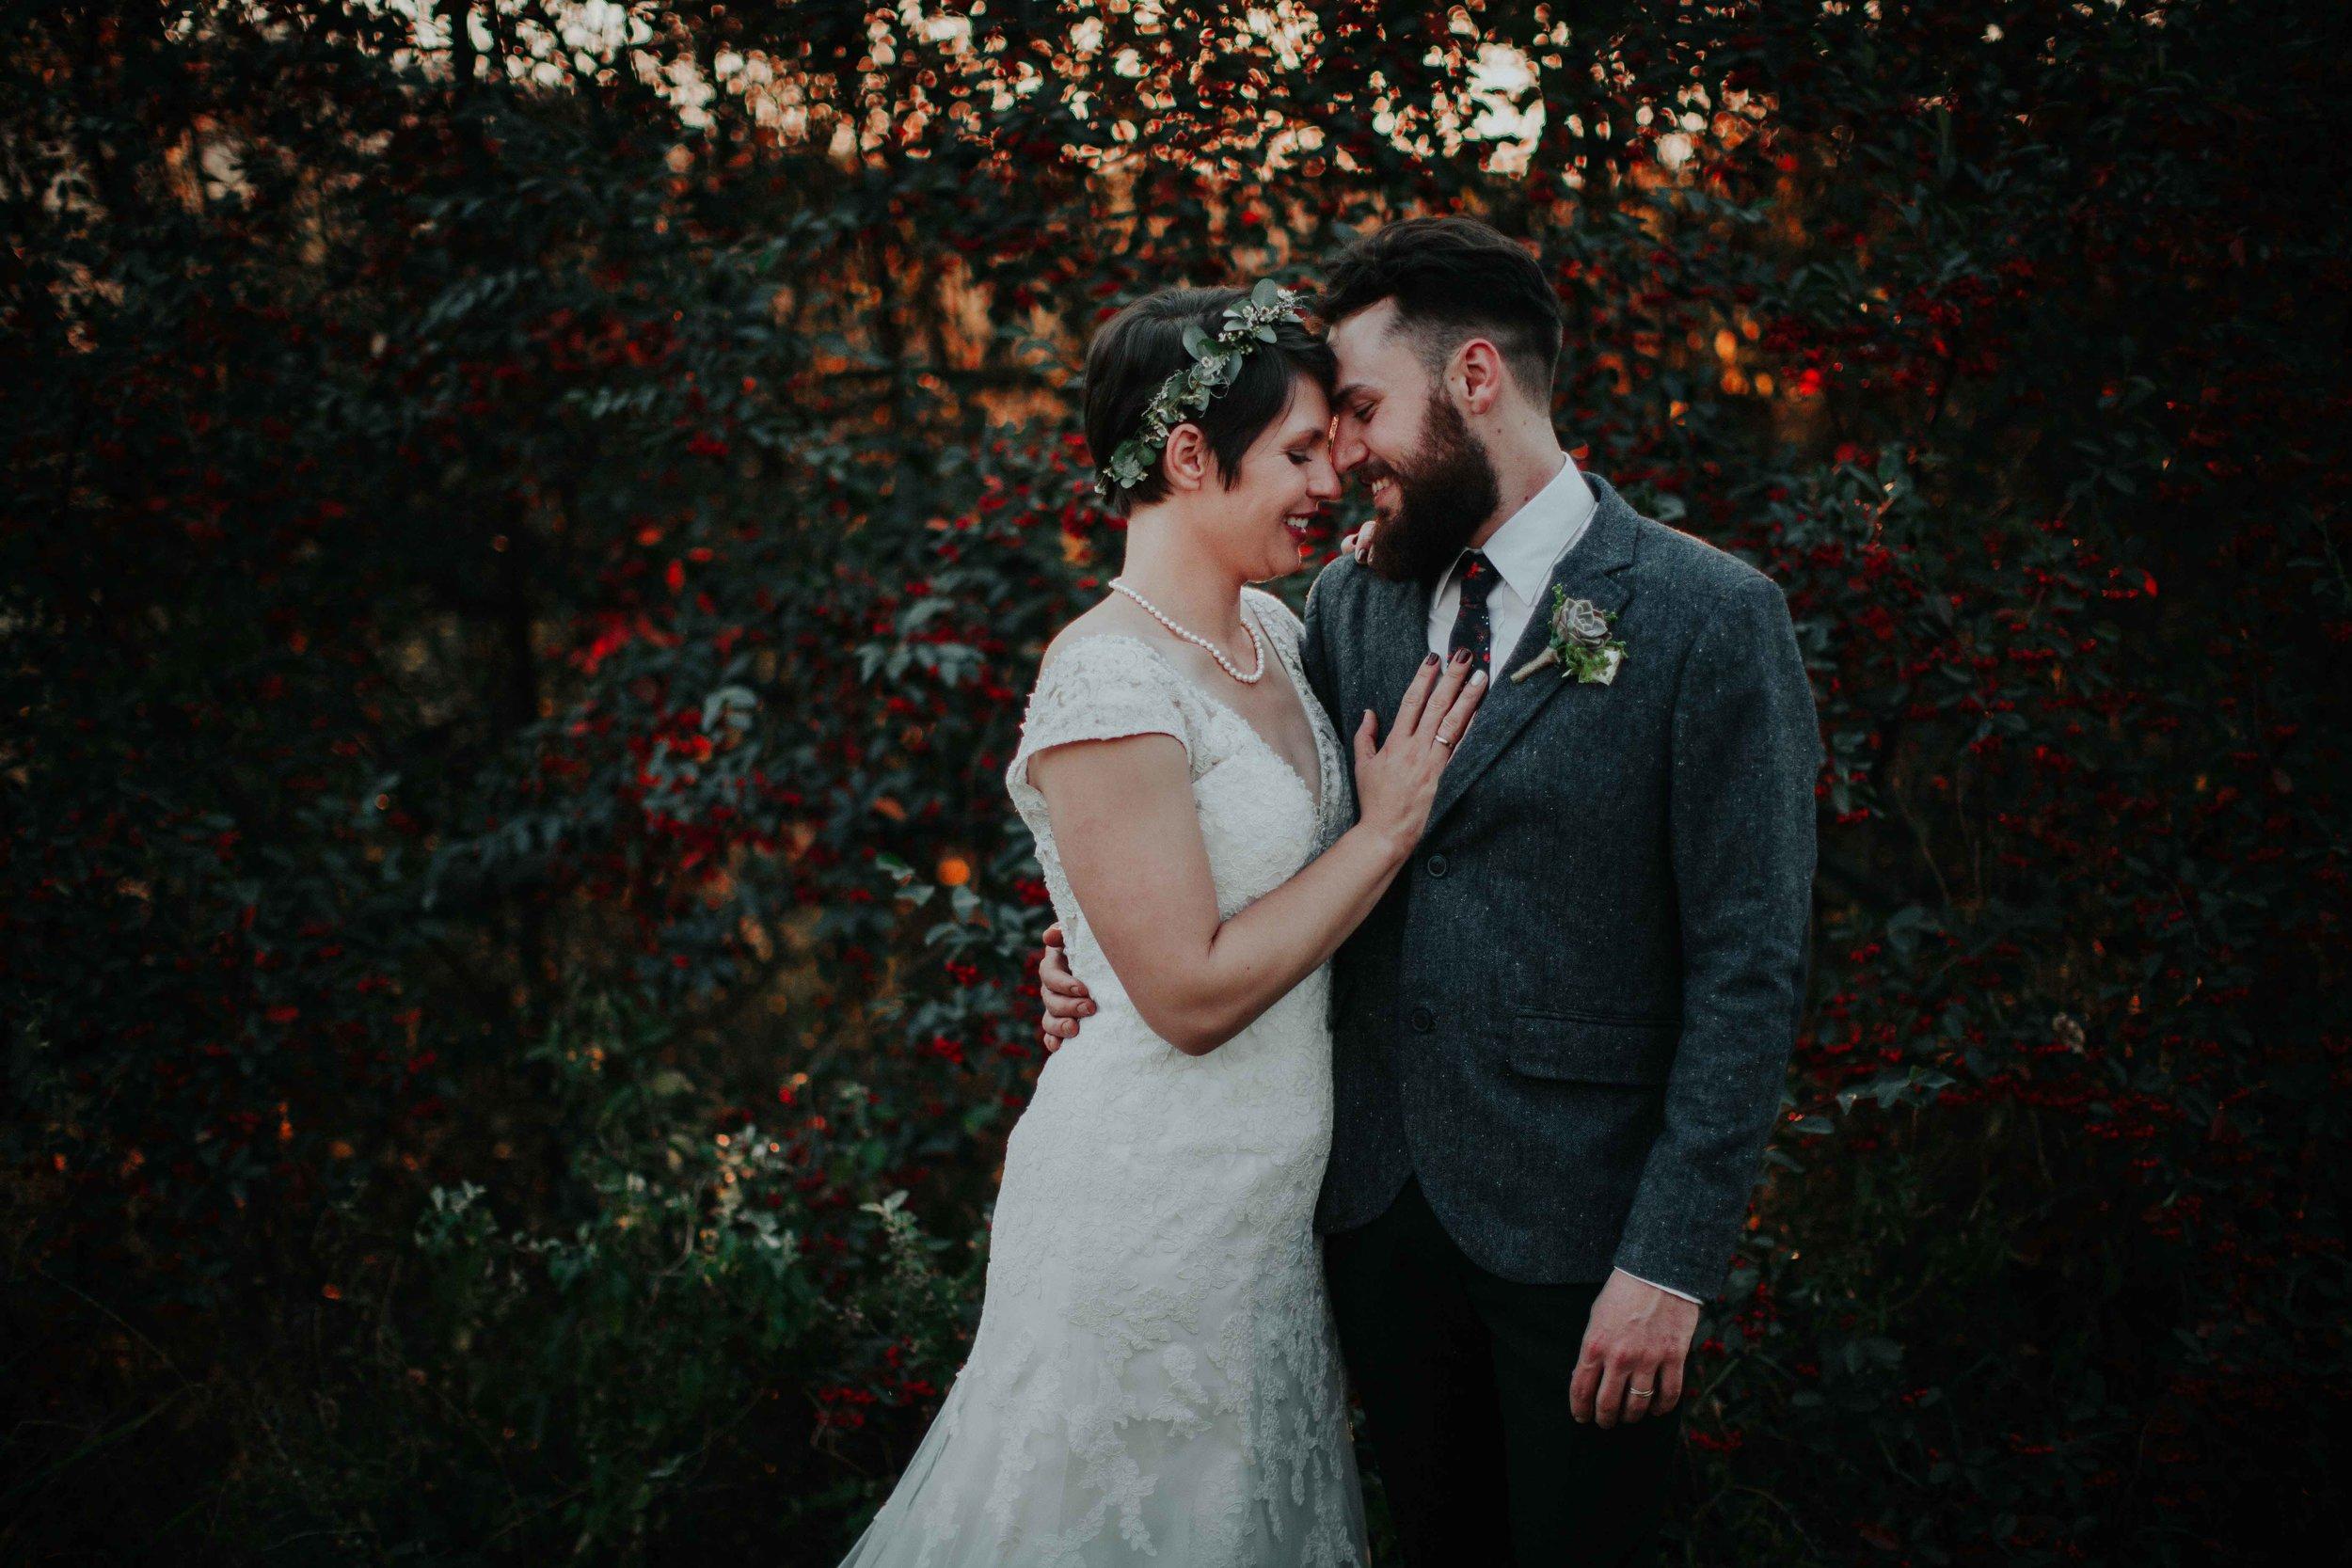 Kristi Smith Photography - Wedding Photography 2.jpg